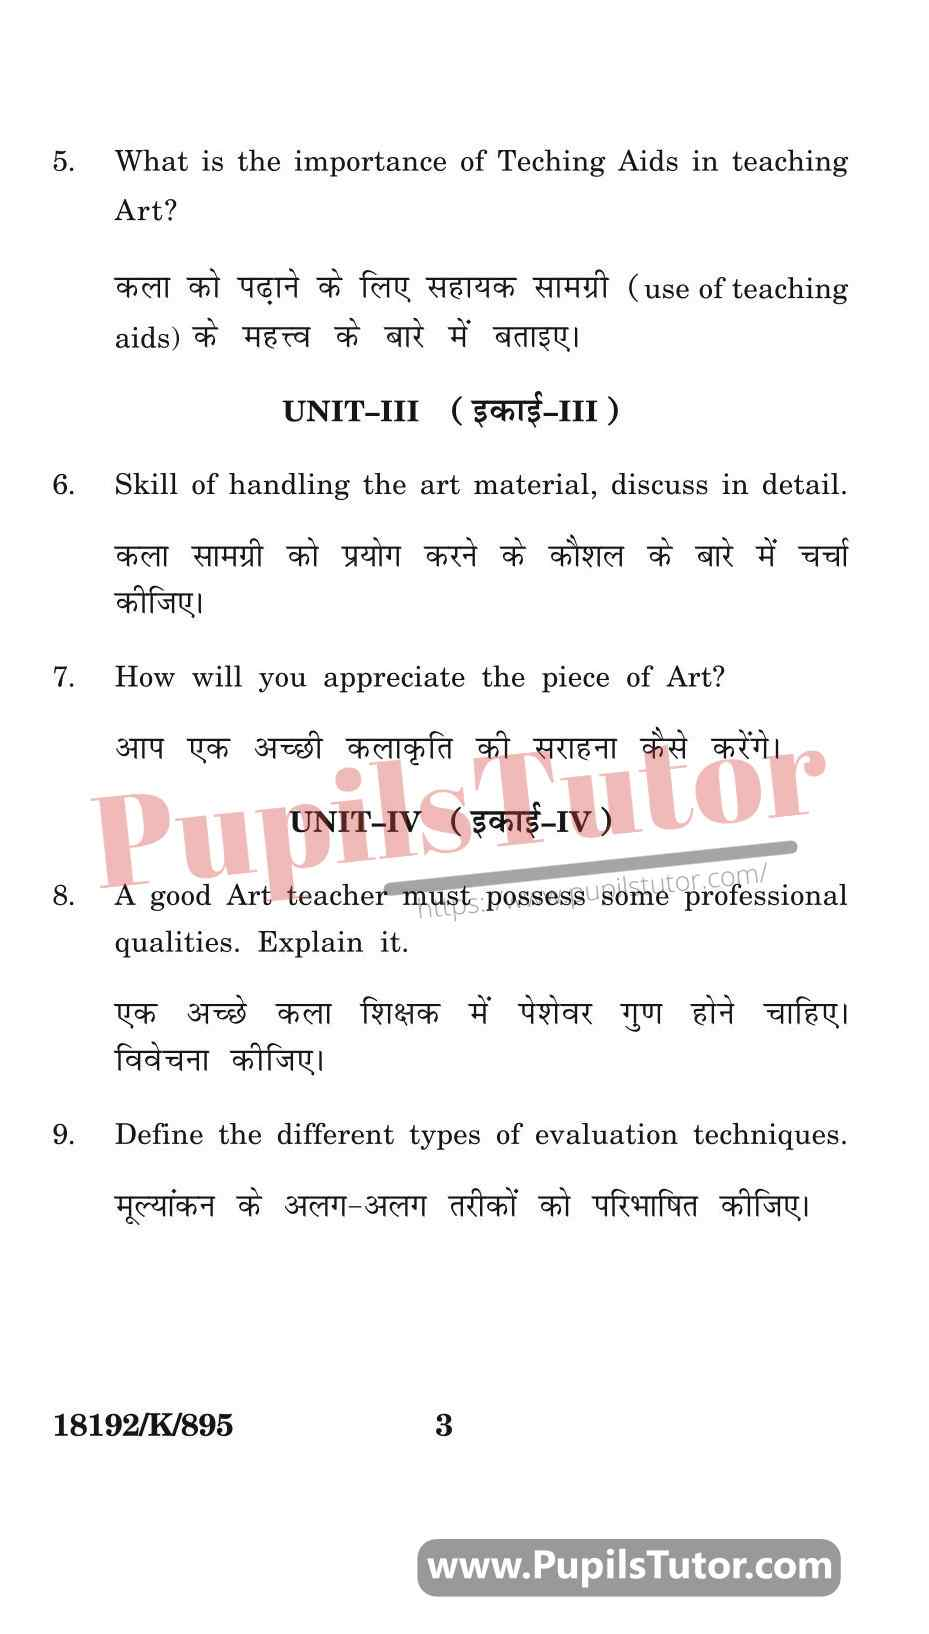 KUK (Kurukshetra University, Haryana) Pedagogy Of Art Question Paper 2020 For B.Ed 1st And 2nd Year And All The 4 Semesters In English And Hindi Medium Free Download PDF - Page 3 - pupilstutor